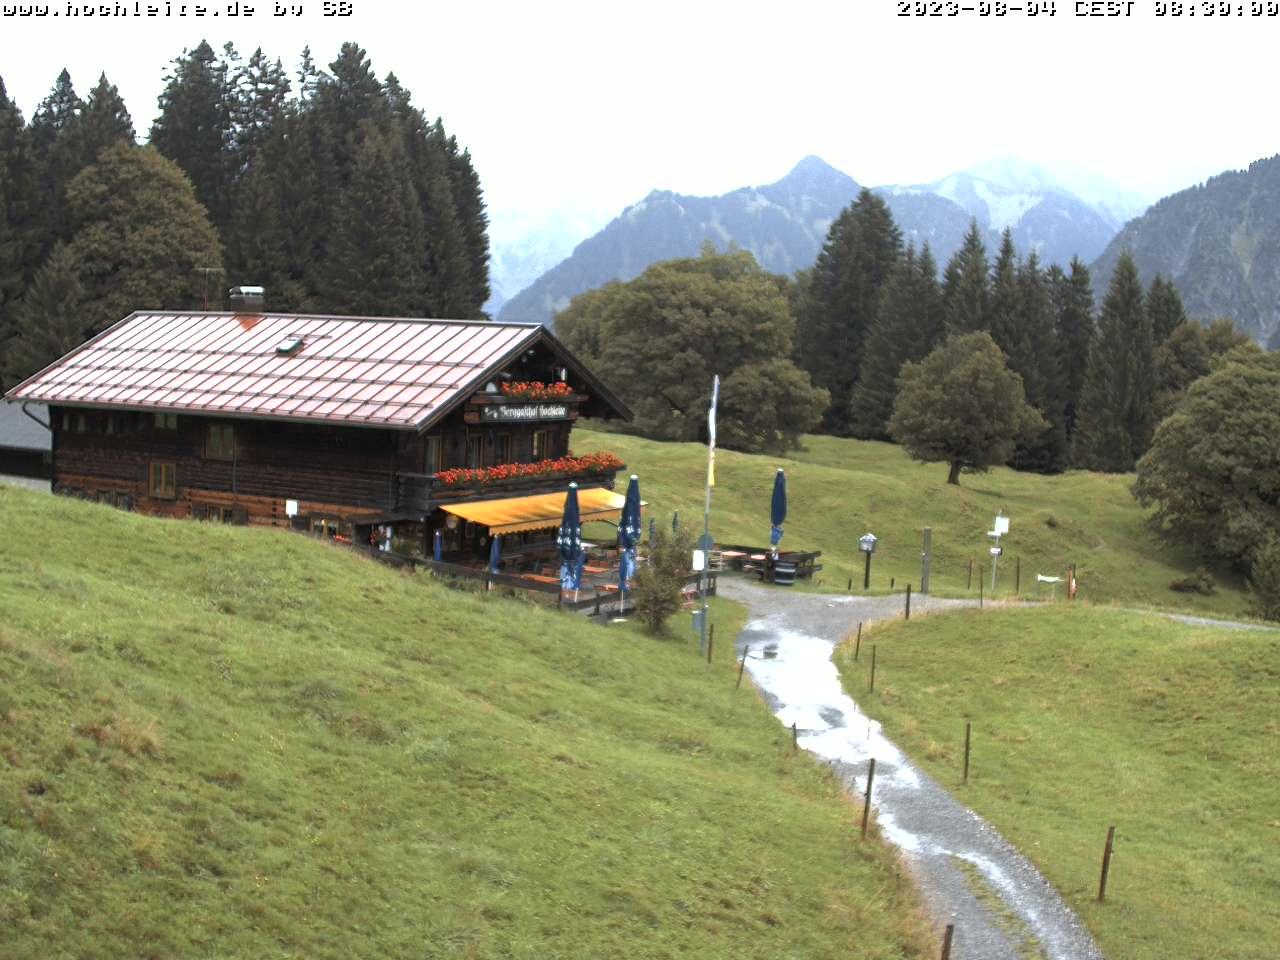 Oberstdorf, Hochleite Lodge (1)